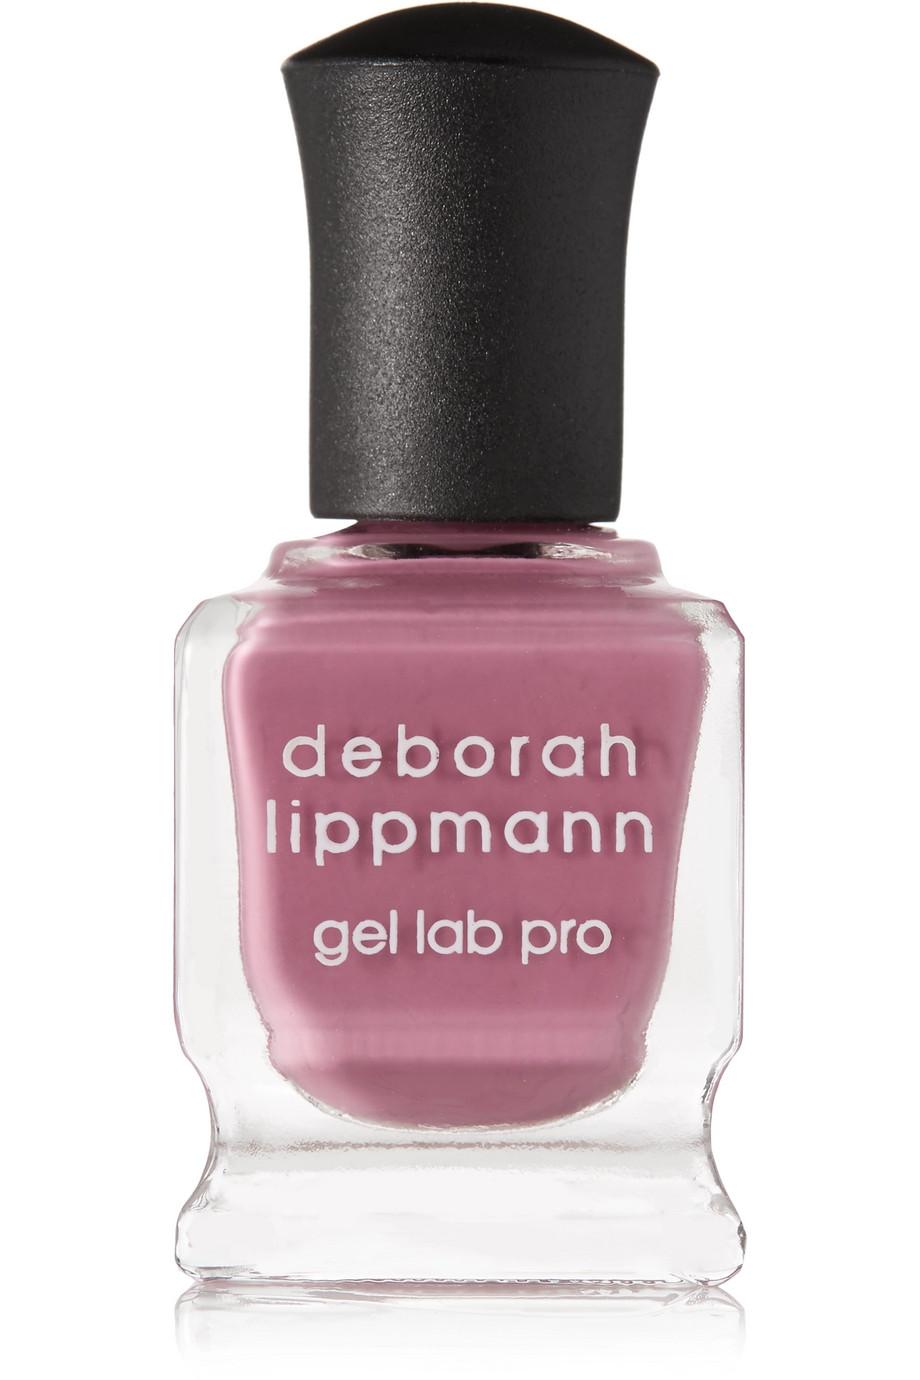 Deborah Lippmann Gel Lab Pro Nail Polish – Sweet Emotion – Nagellack